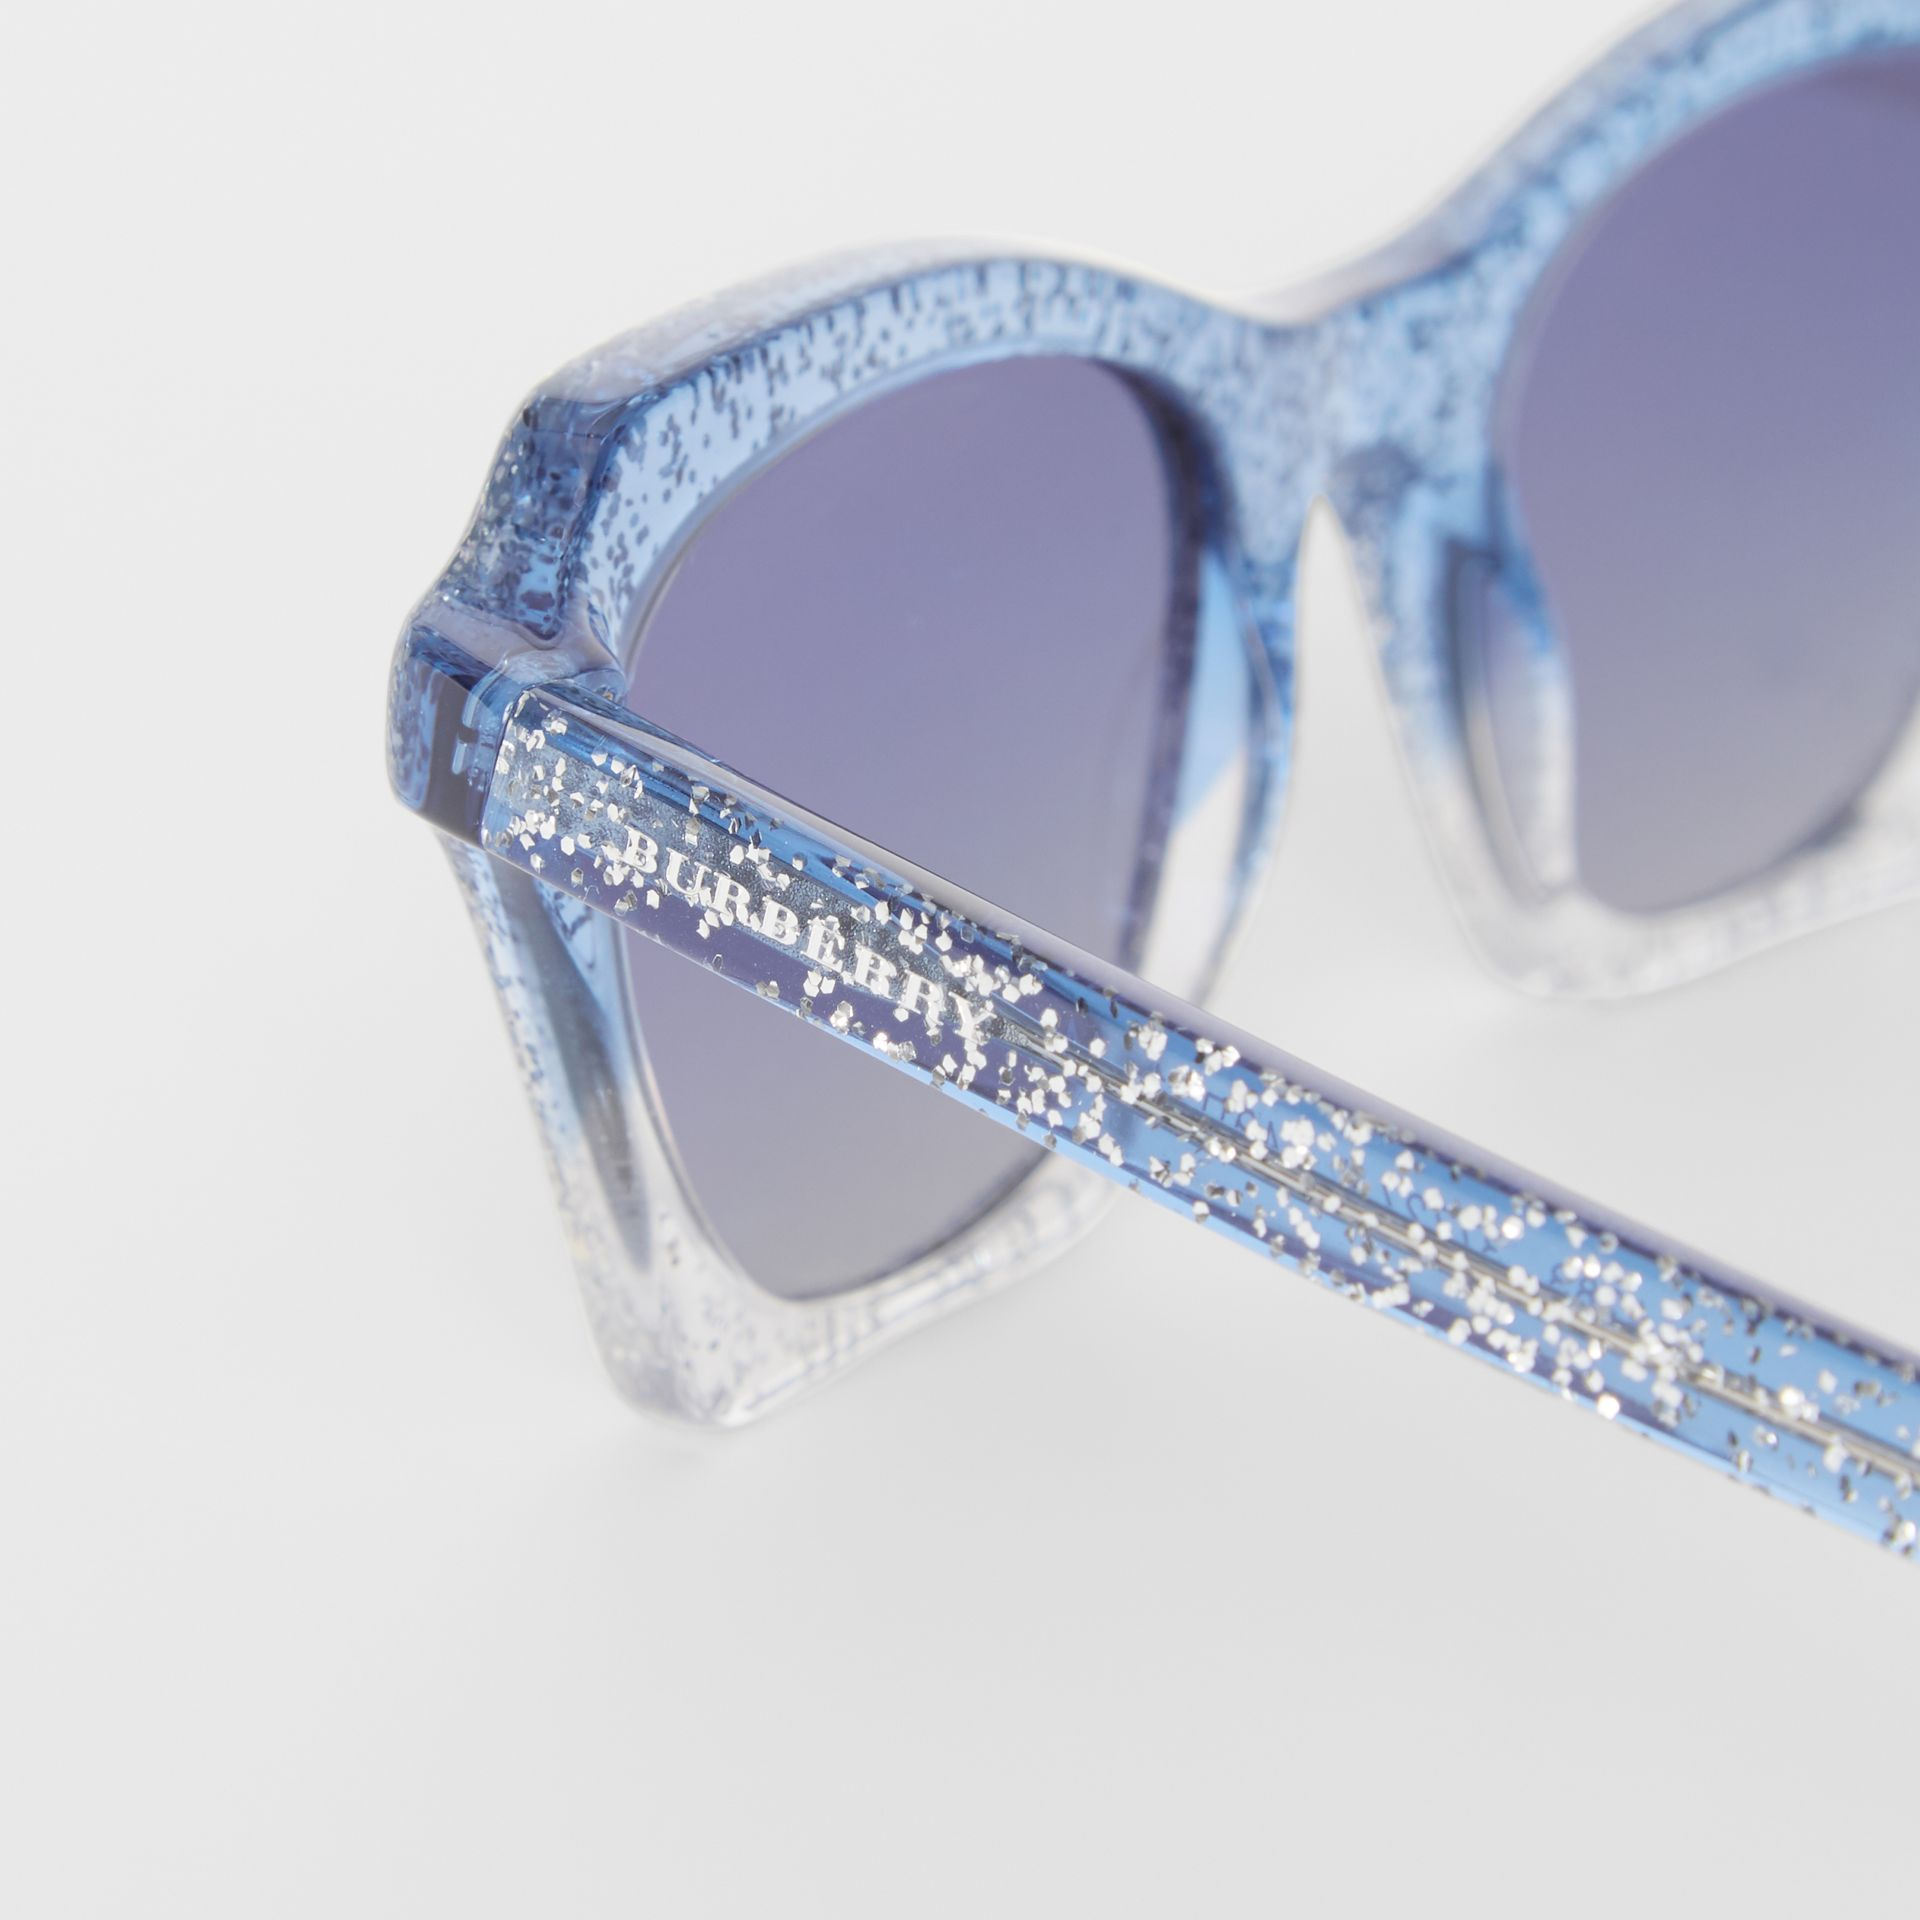 Butterfly Frame Sunglasses in Blue - Women | Burberry Australia - gallery image 1